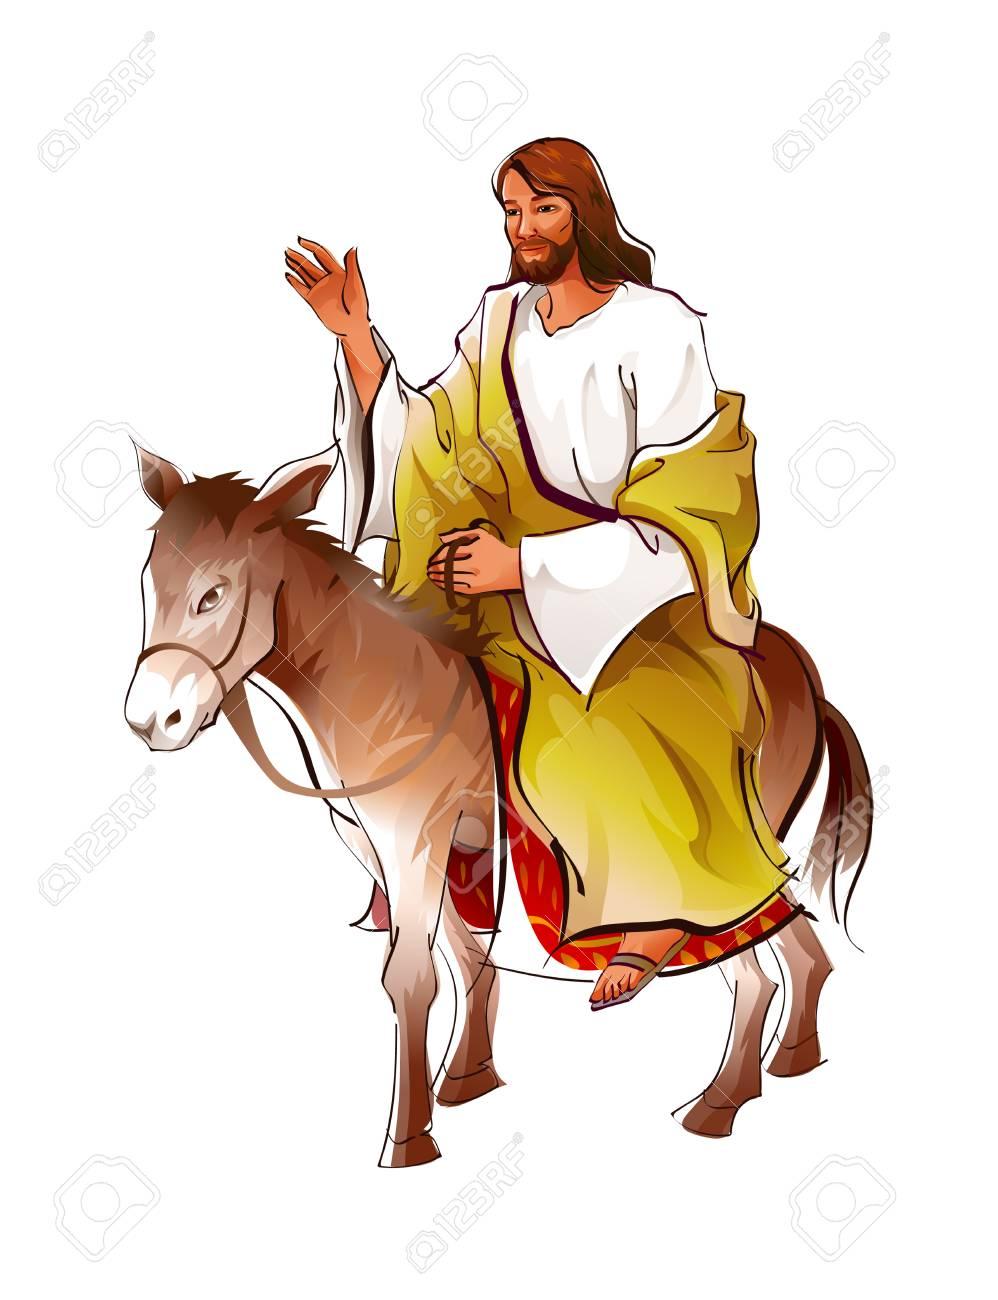 Side view of Jesus Christ sitting on donkey.